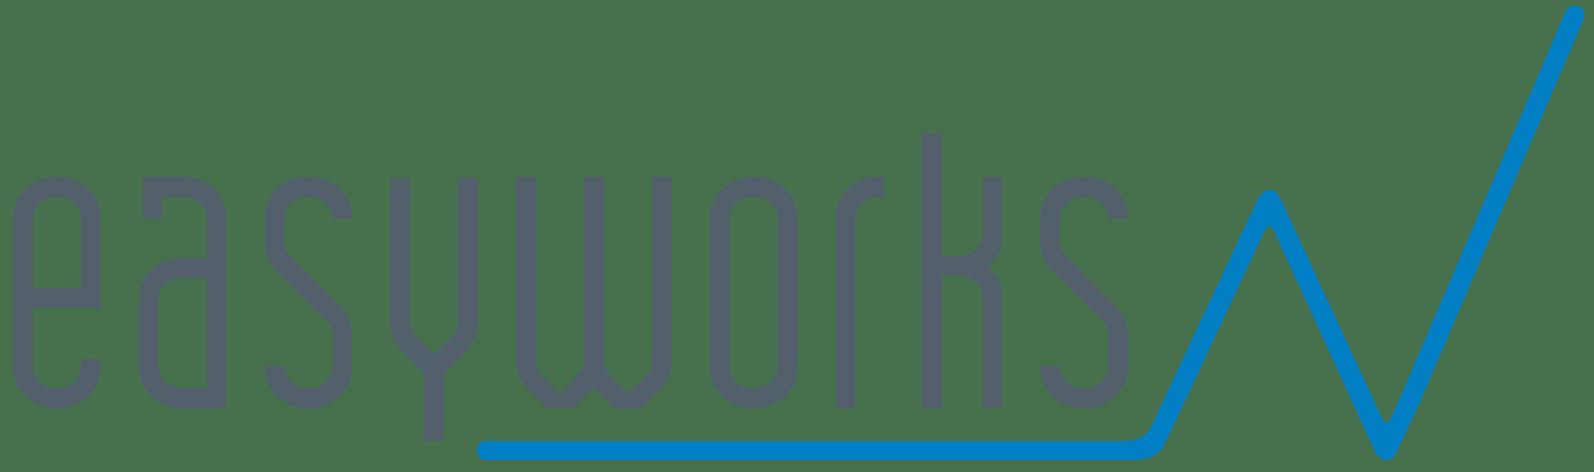 Logomarca-Easyworks